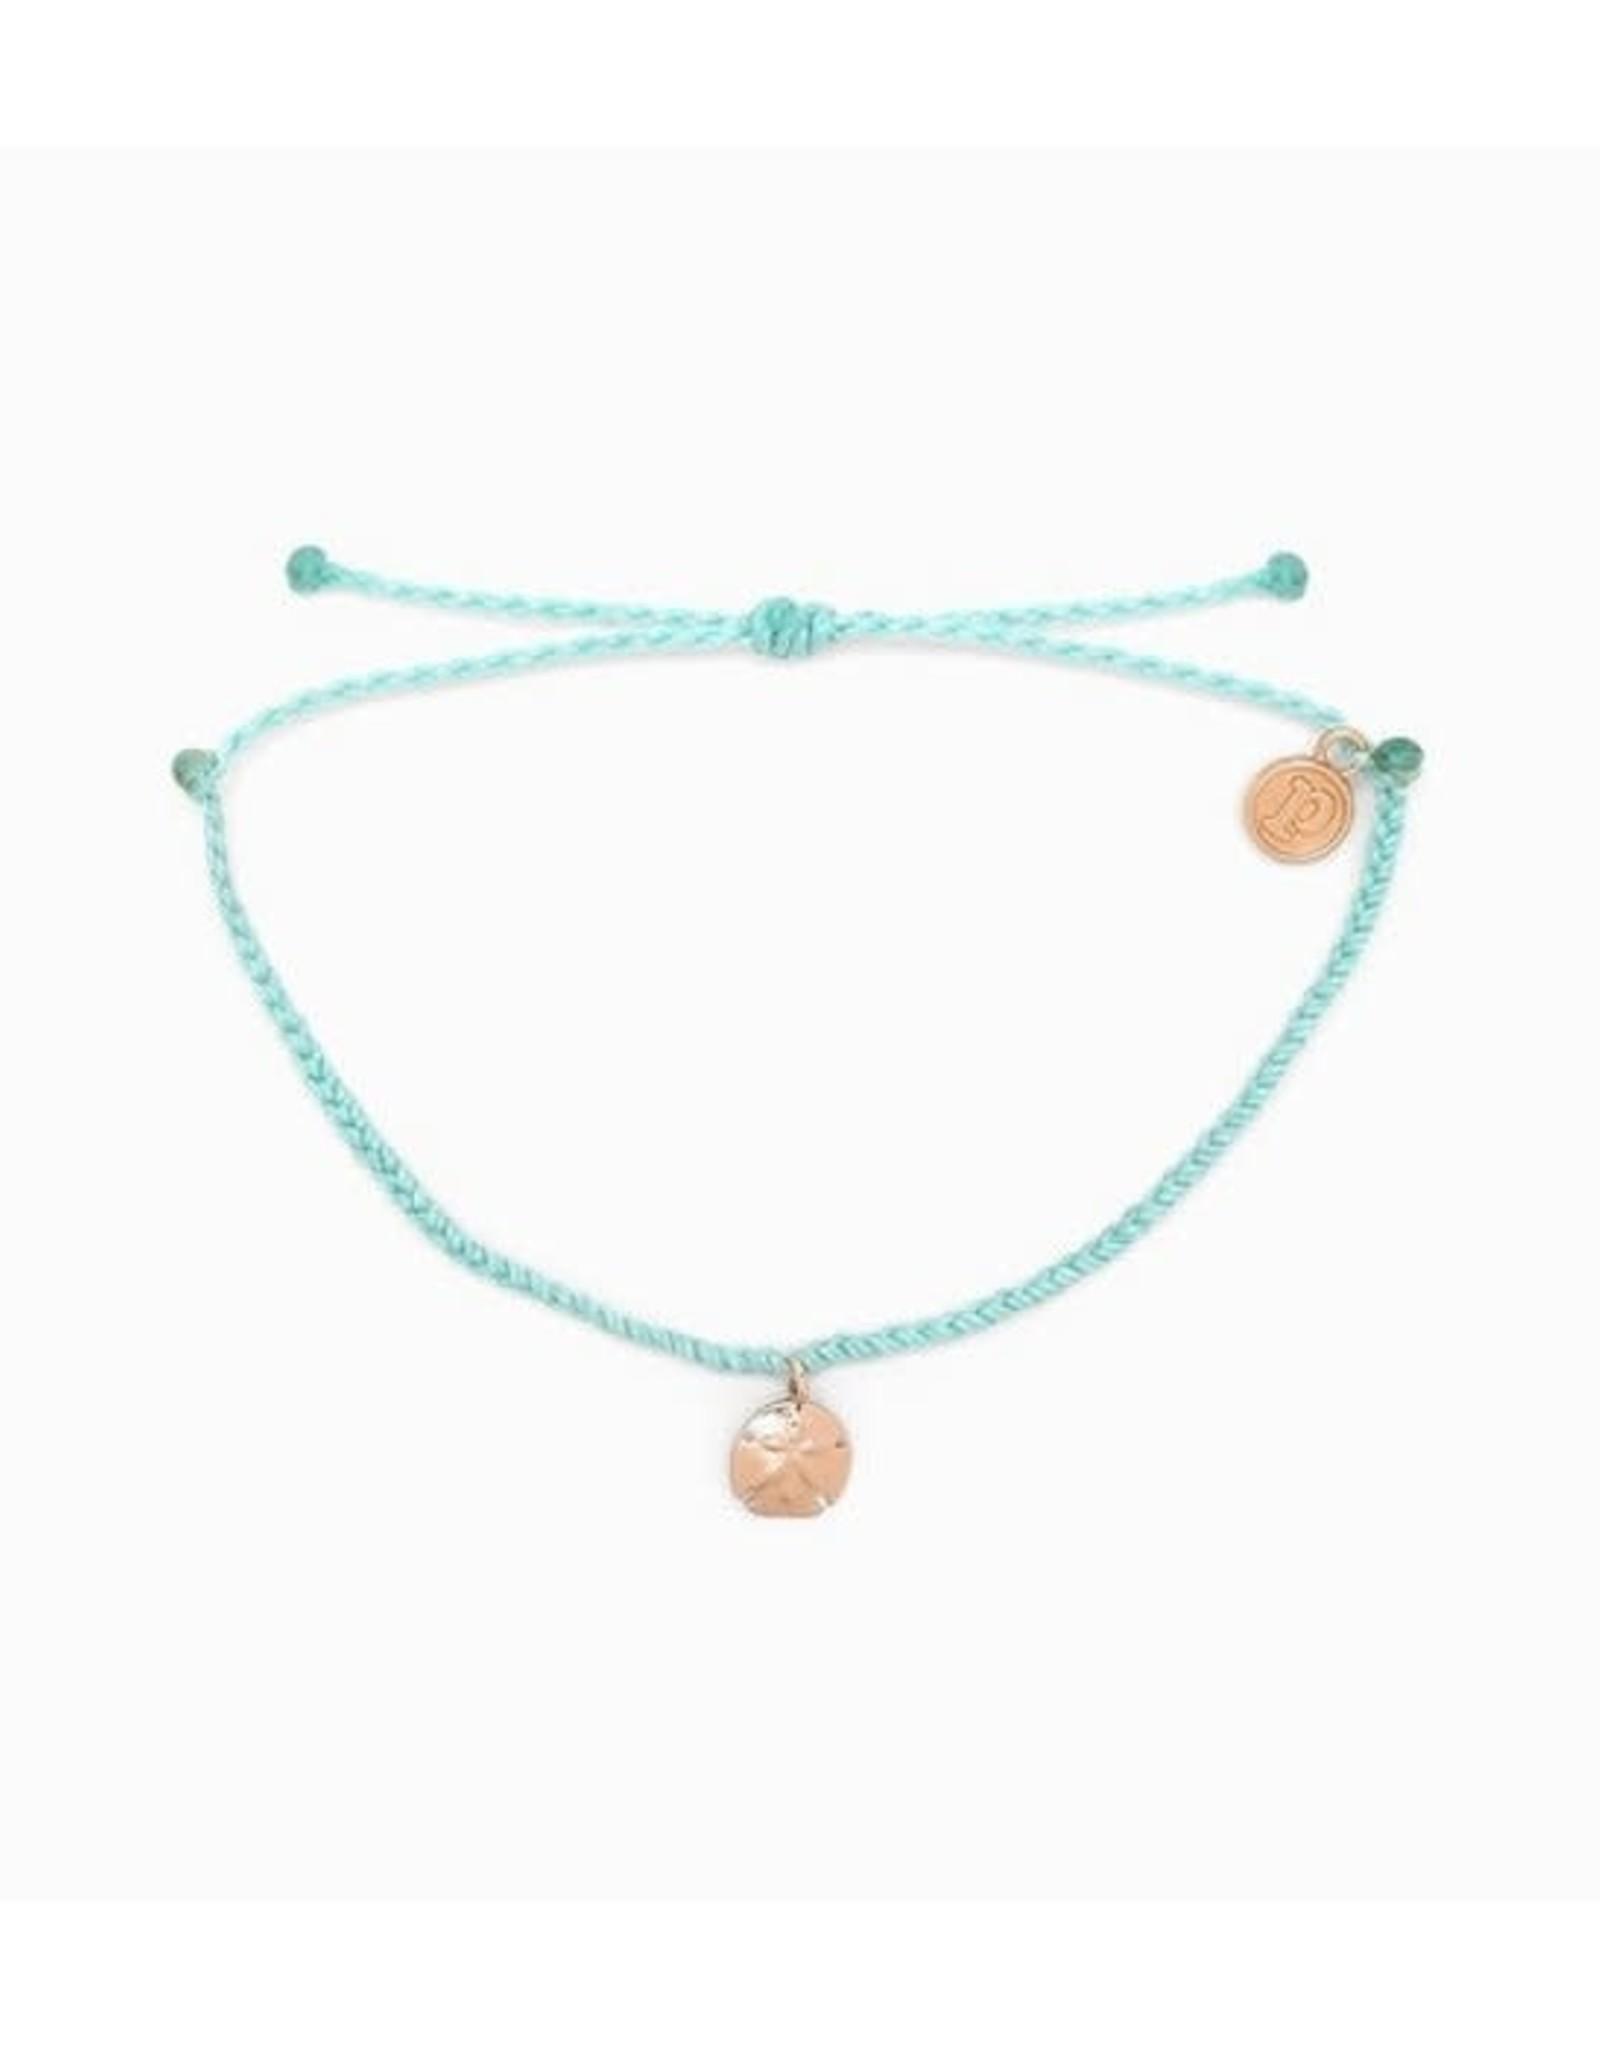 ROSE GOLD SAND DOLLAR Bracelet, SEAFOAM